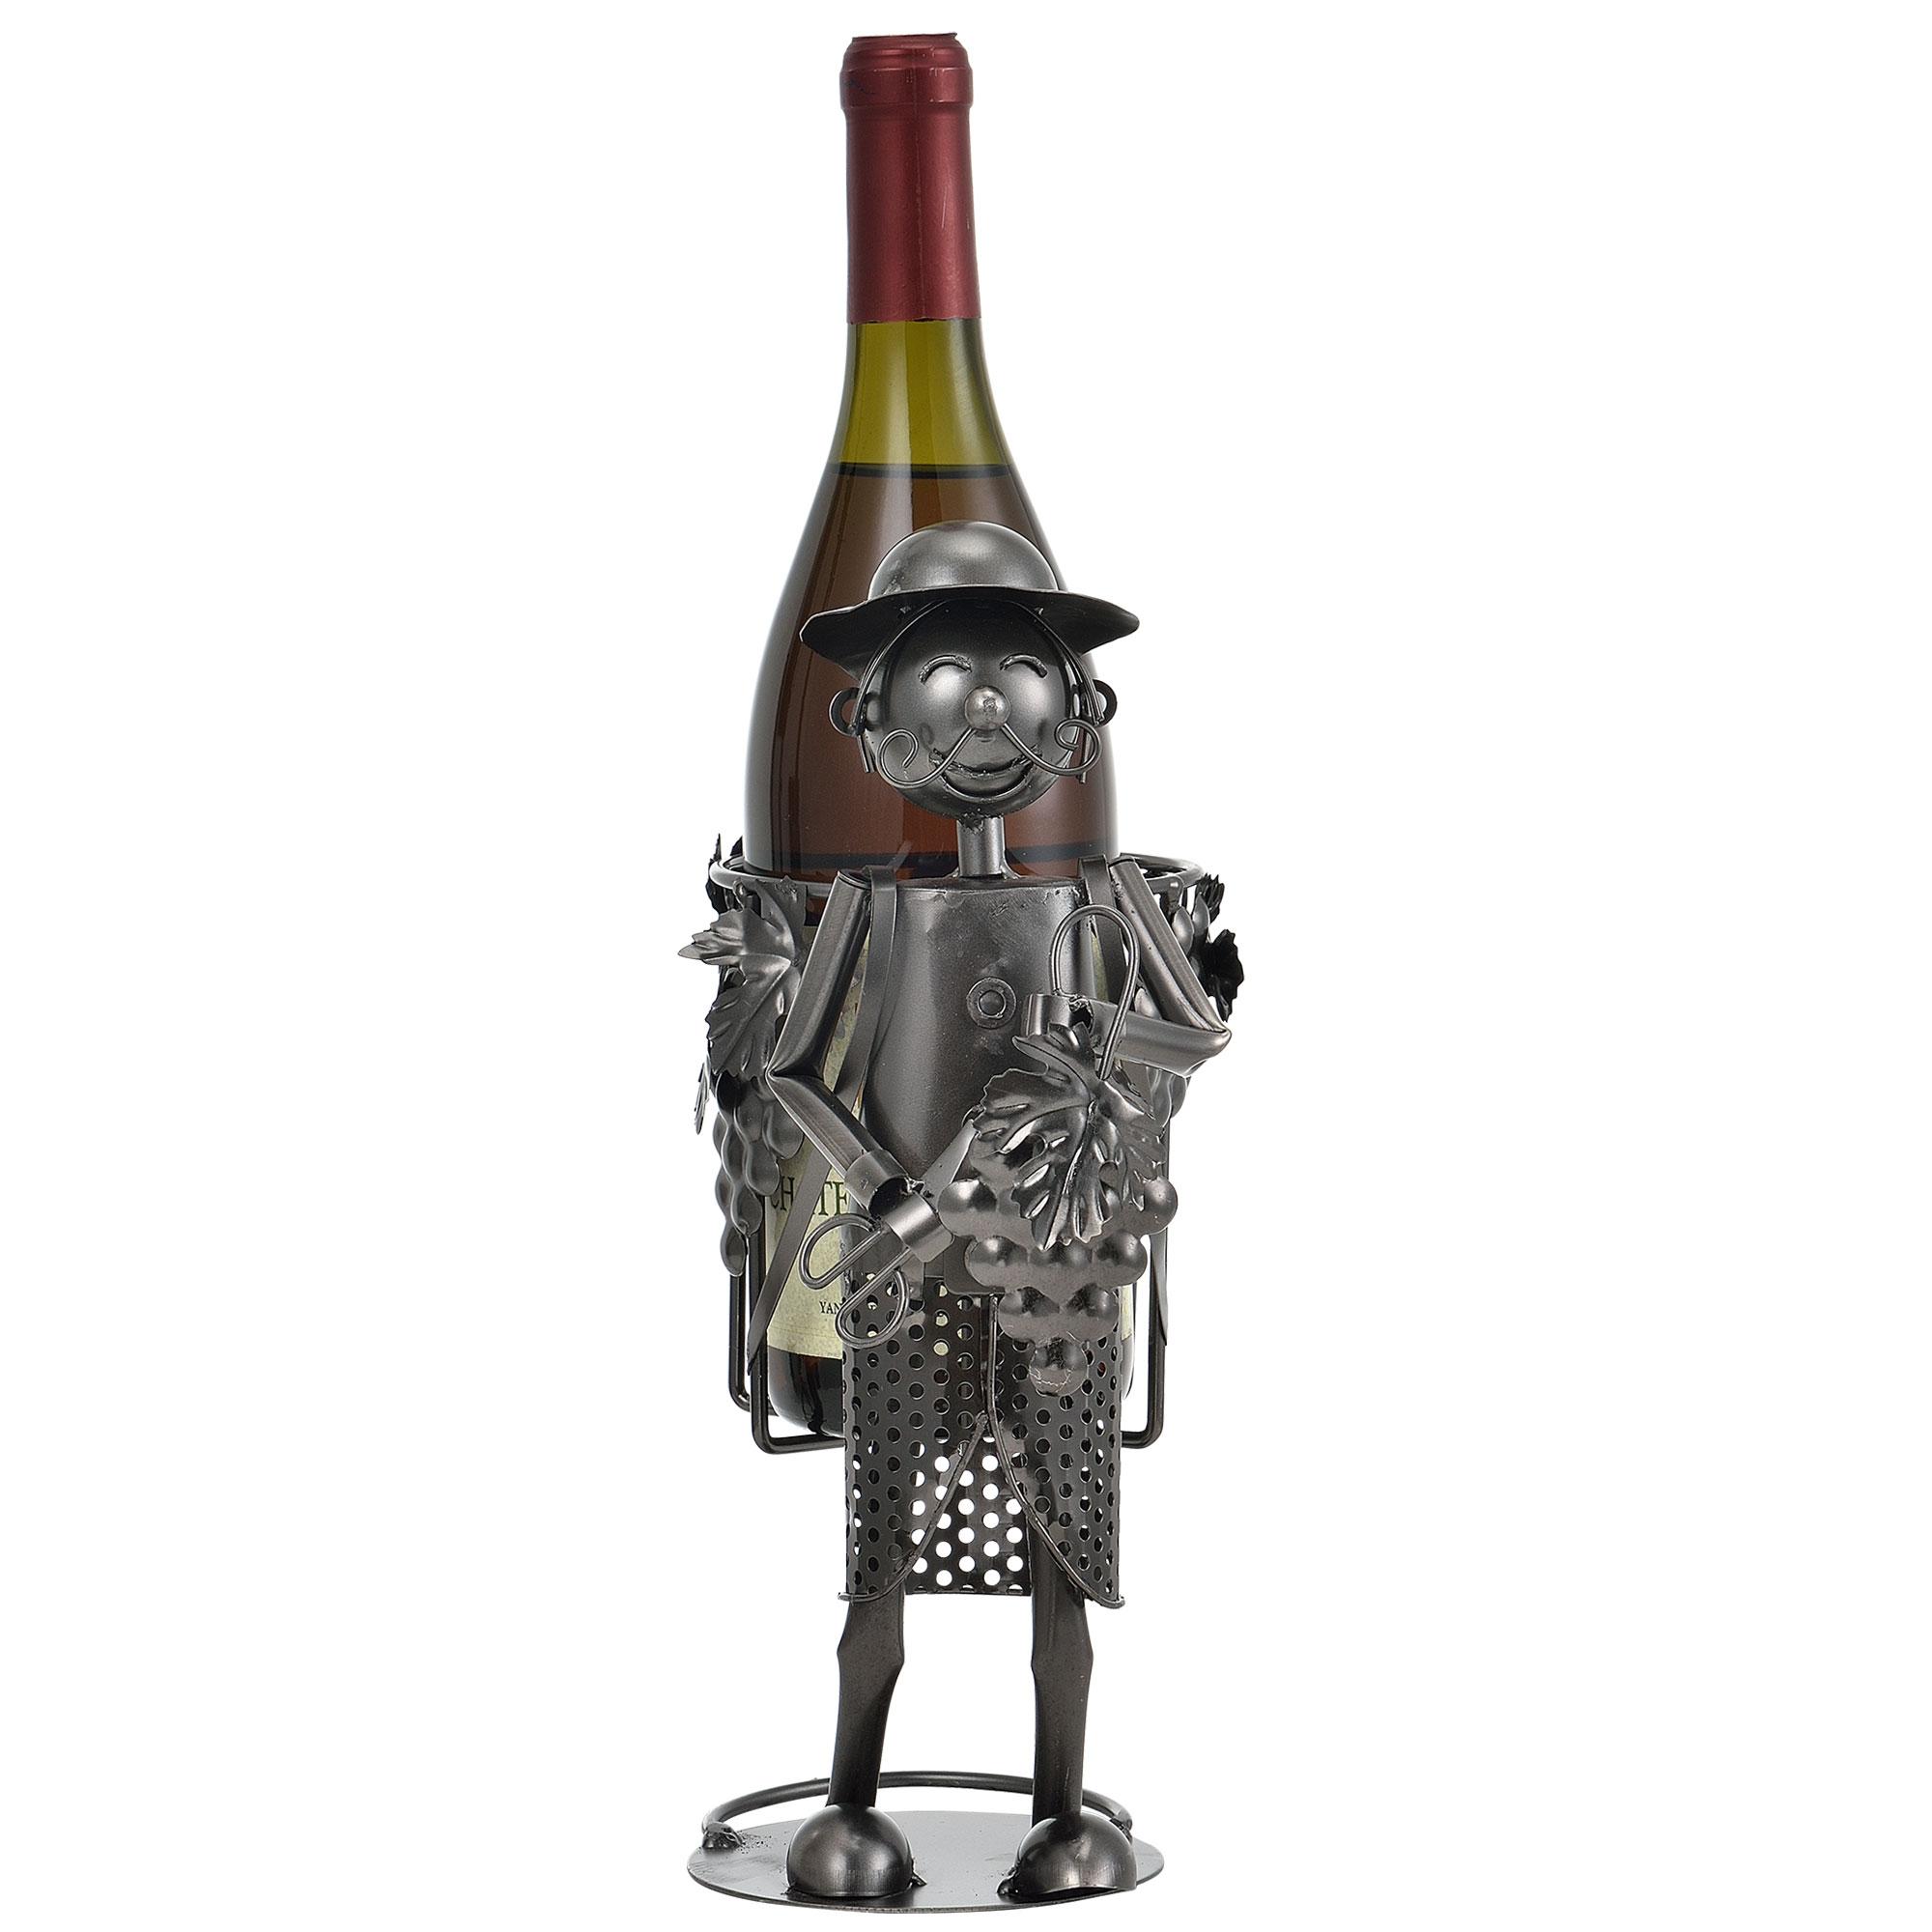 range bouteilles viticulteur support pour vin. Black Bedroom Furniture Sets. Home Design Ideas